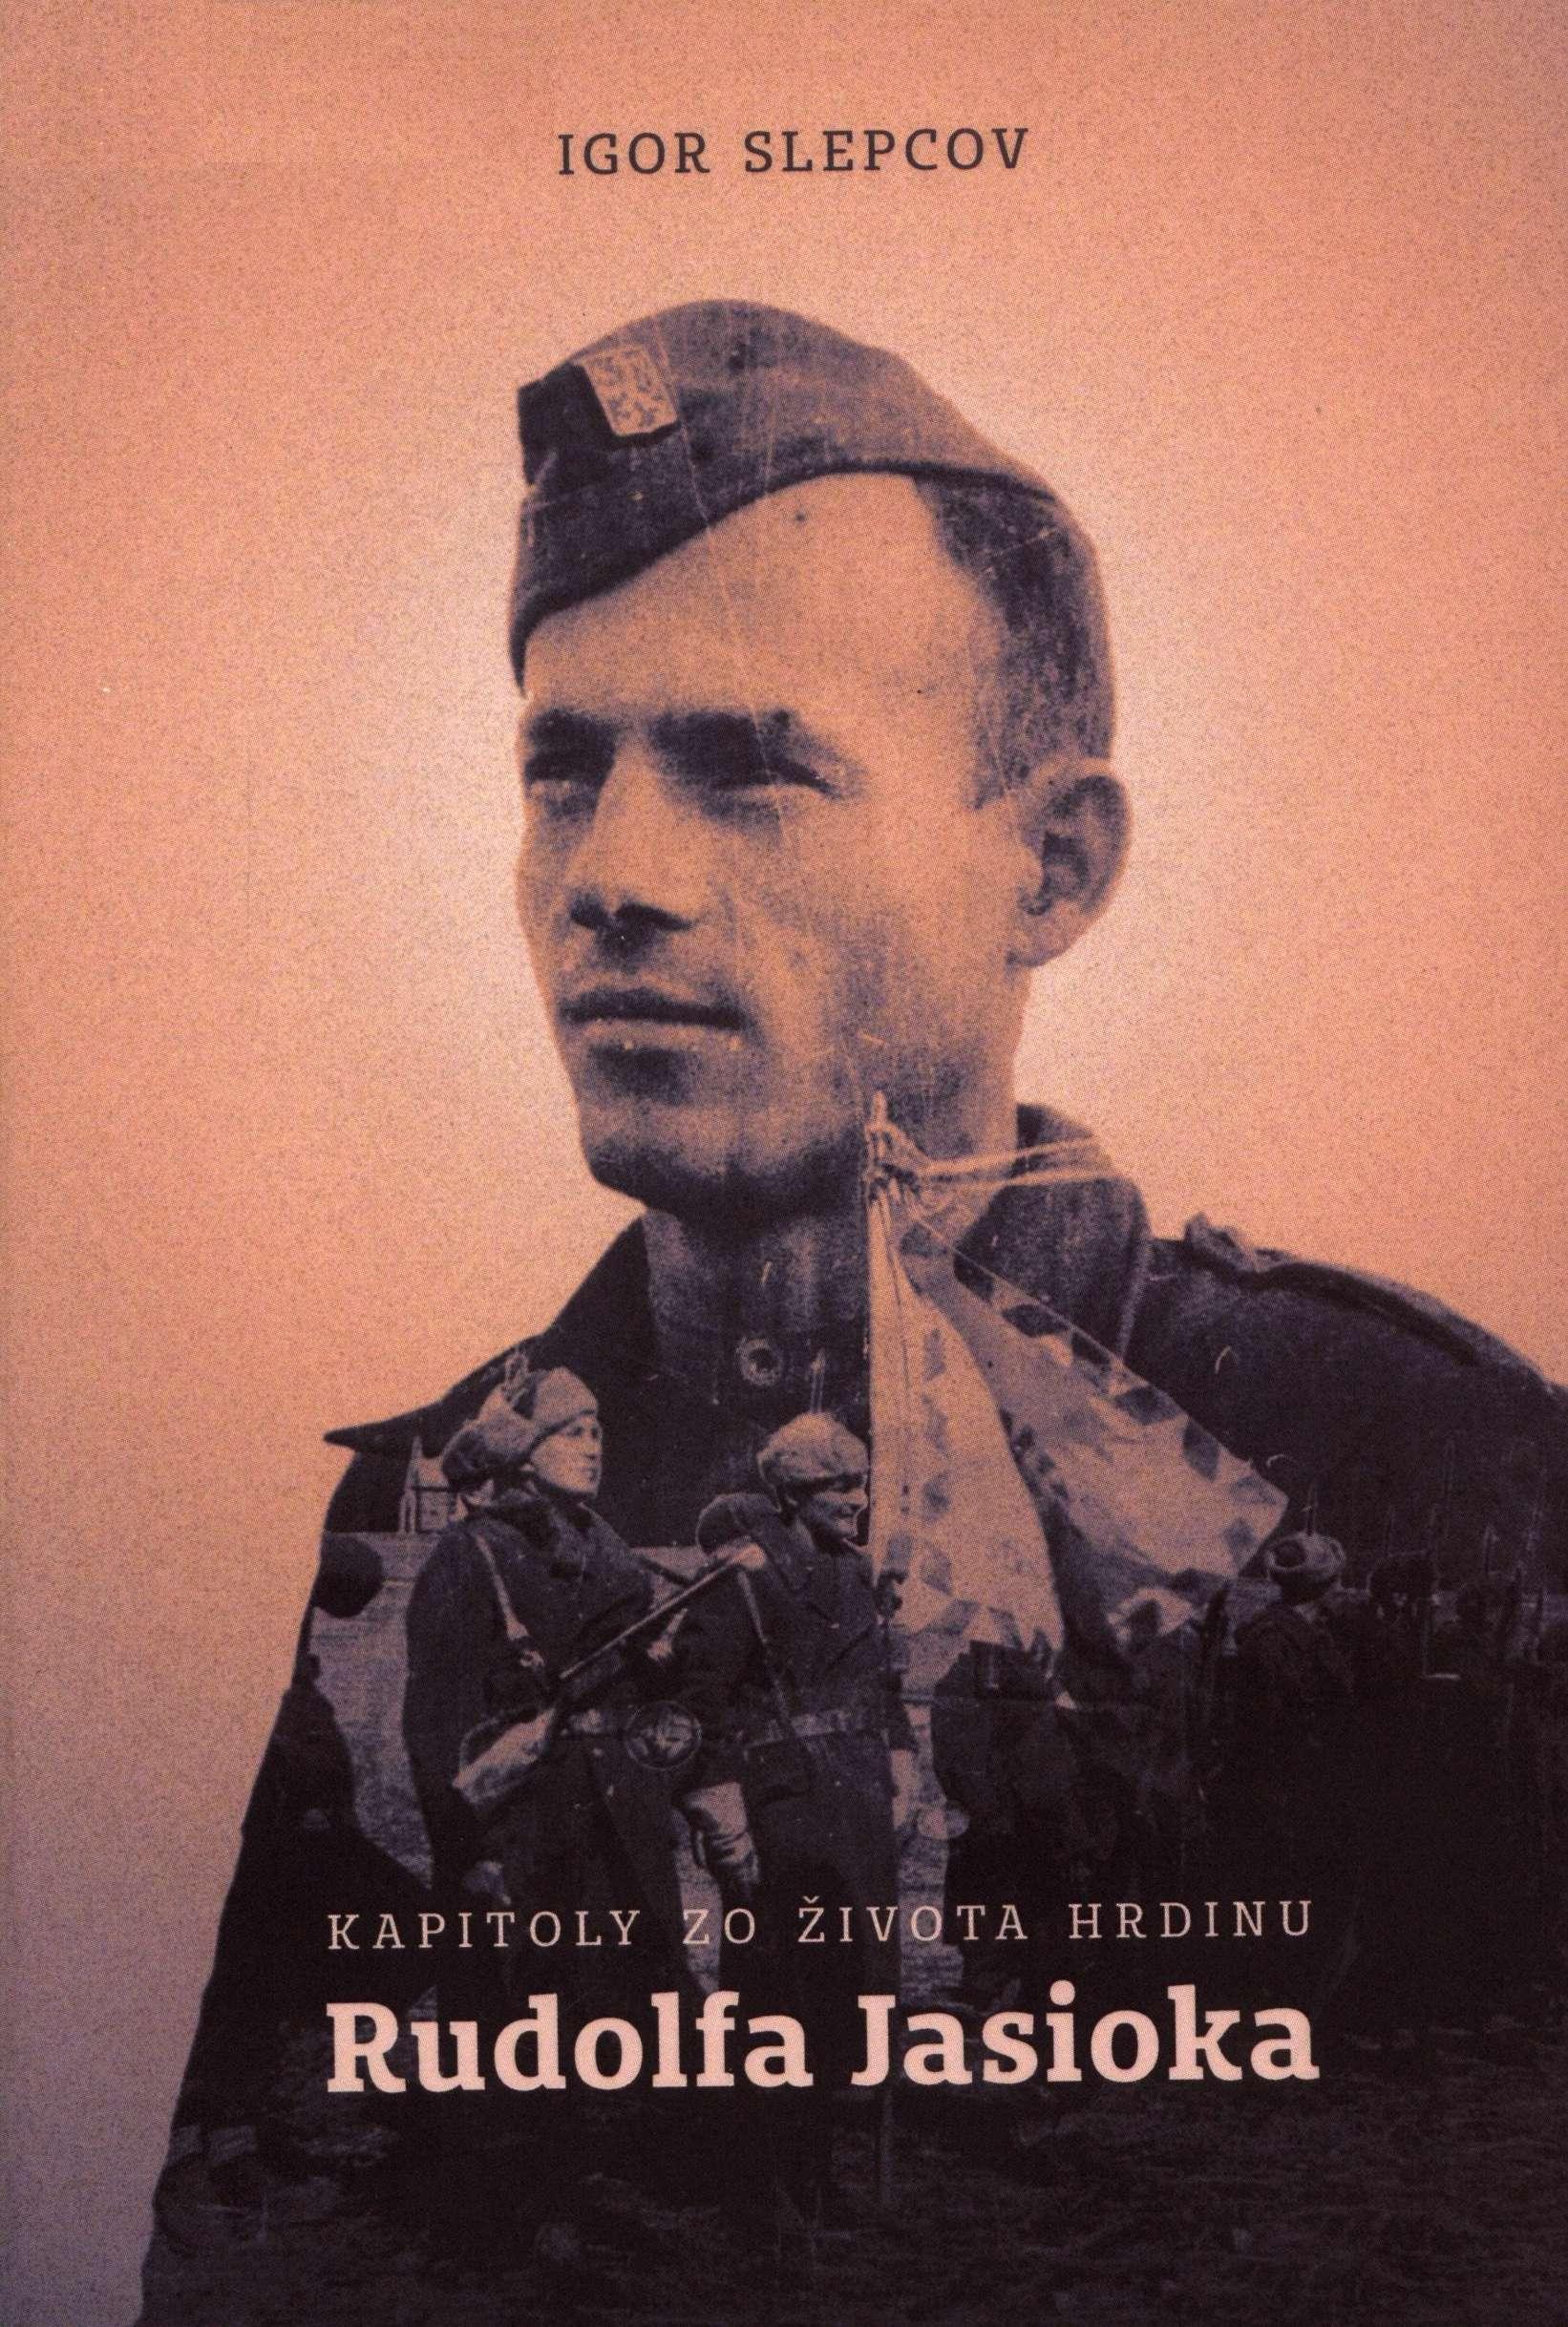 SLEPCOV, Igor. Kapitoly zo života hrdinu Rudolfa Jasioka